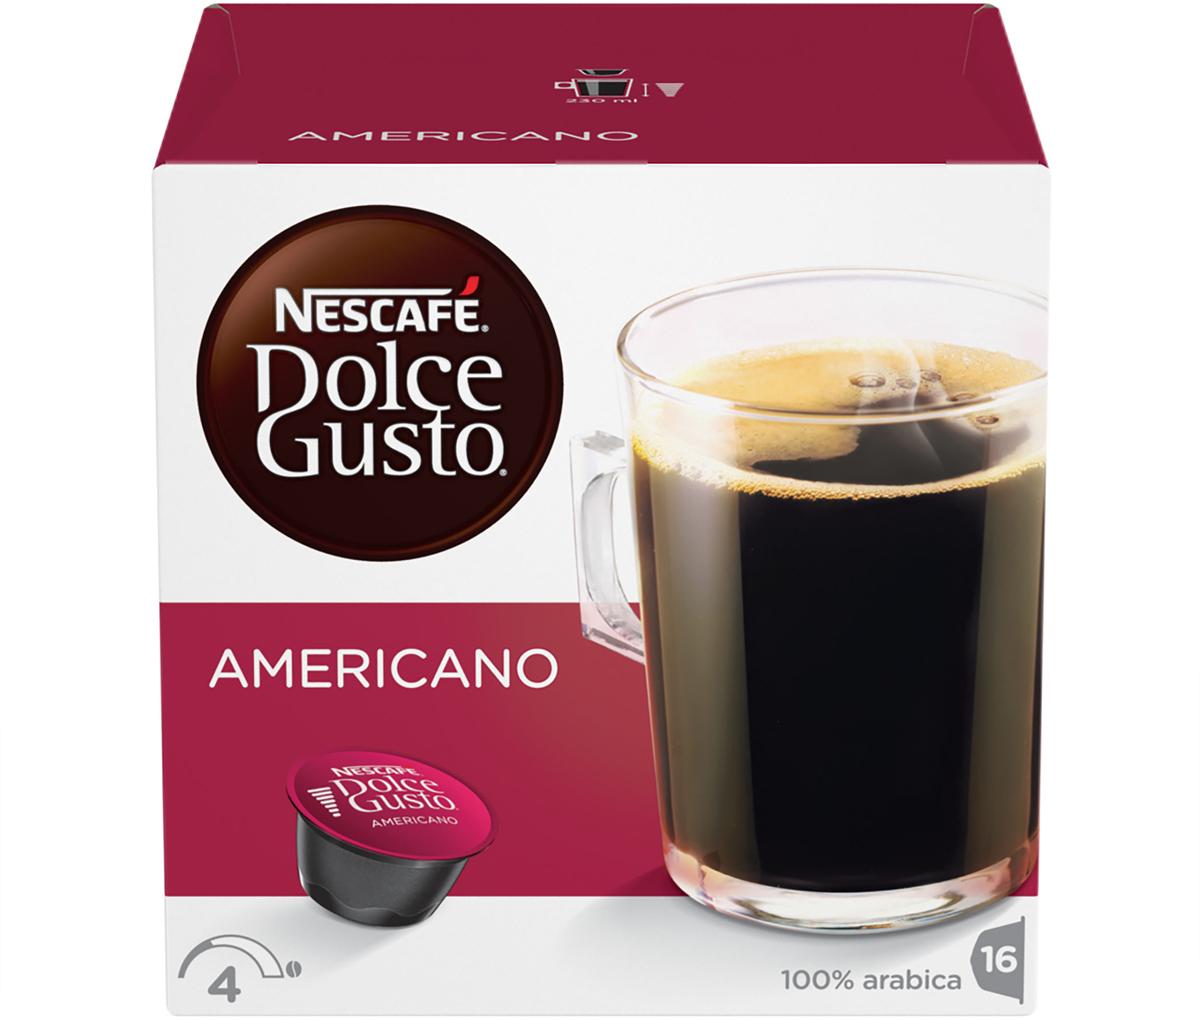 Nescafe Dolce Gusto Americano кофе в капсулах, 16 шт nescafe dolce gusto cortado эспрессо с молоком кофе в капсулах 16 шт